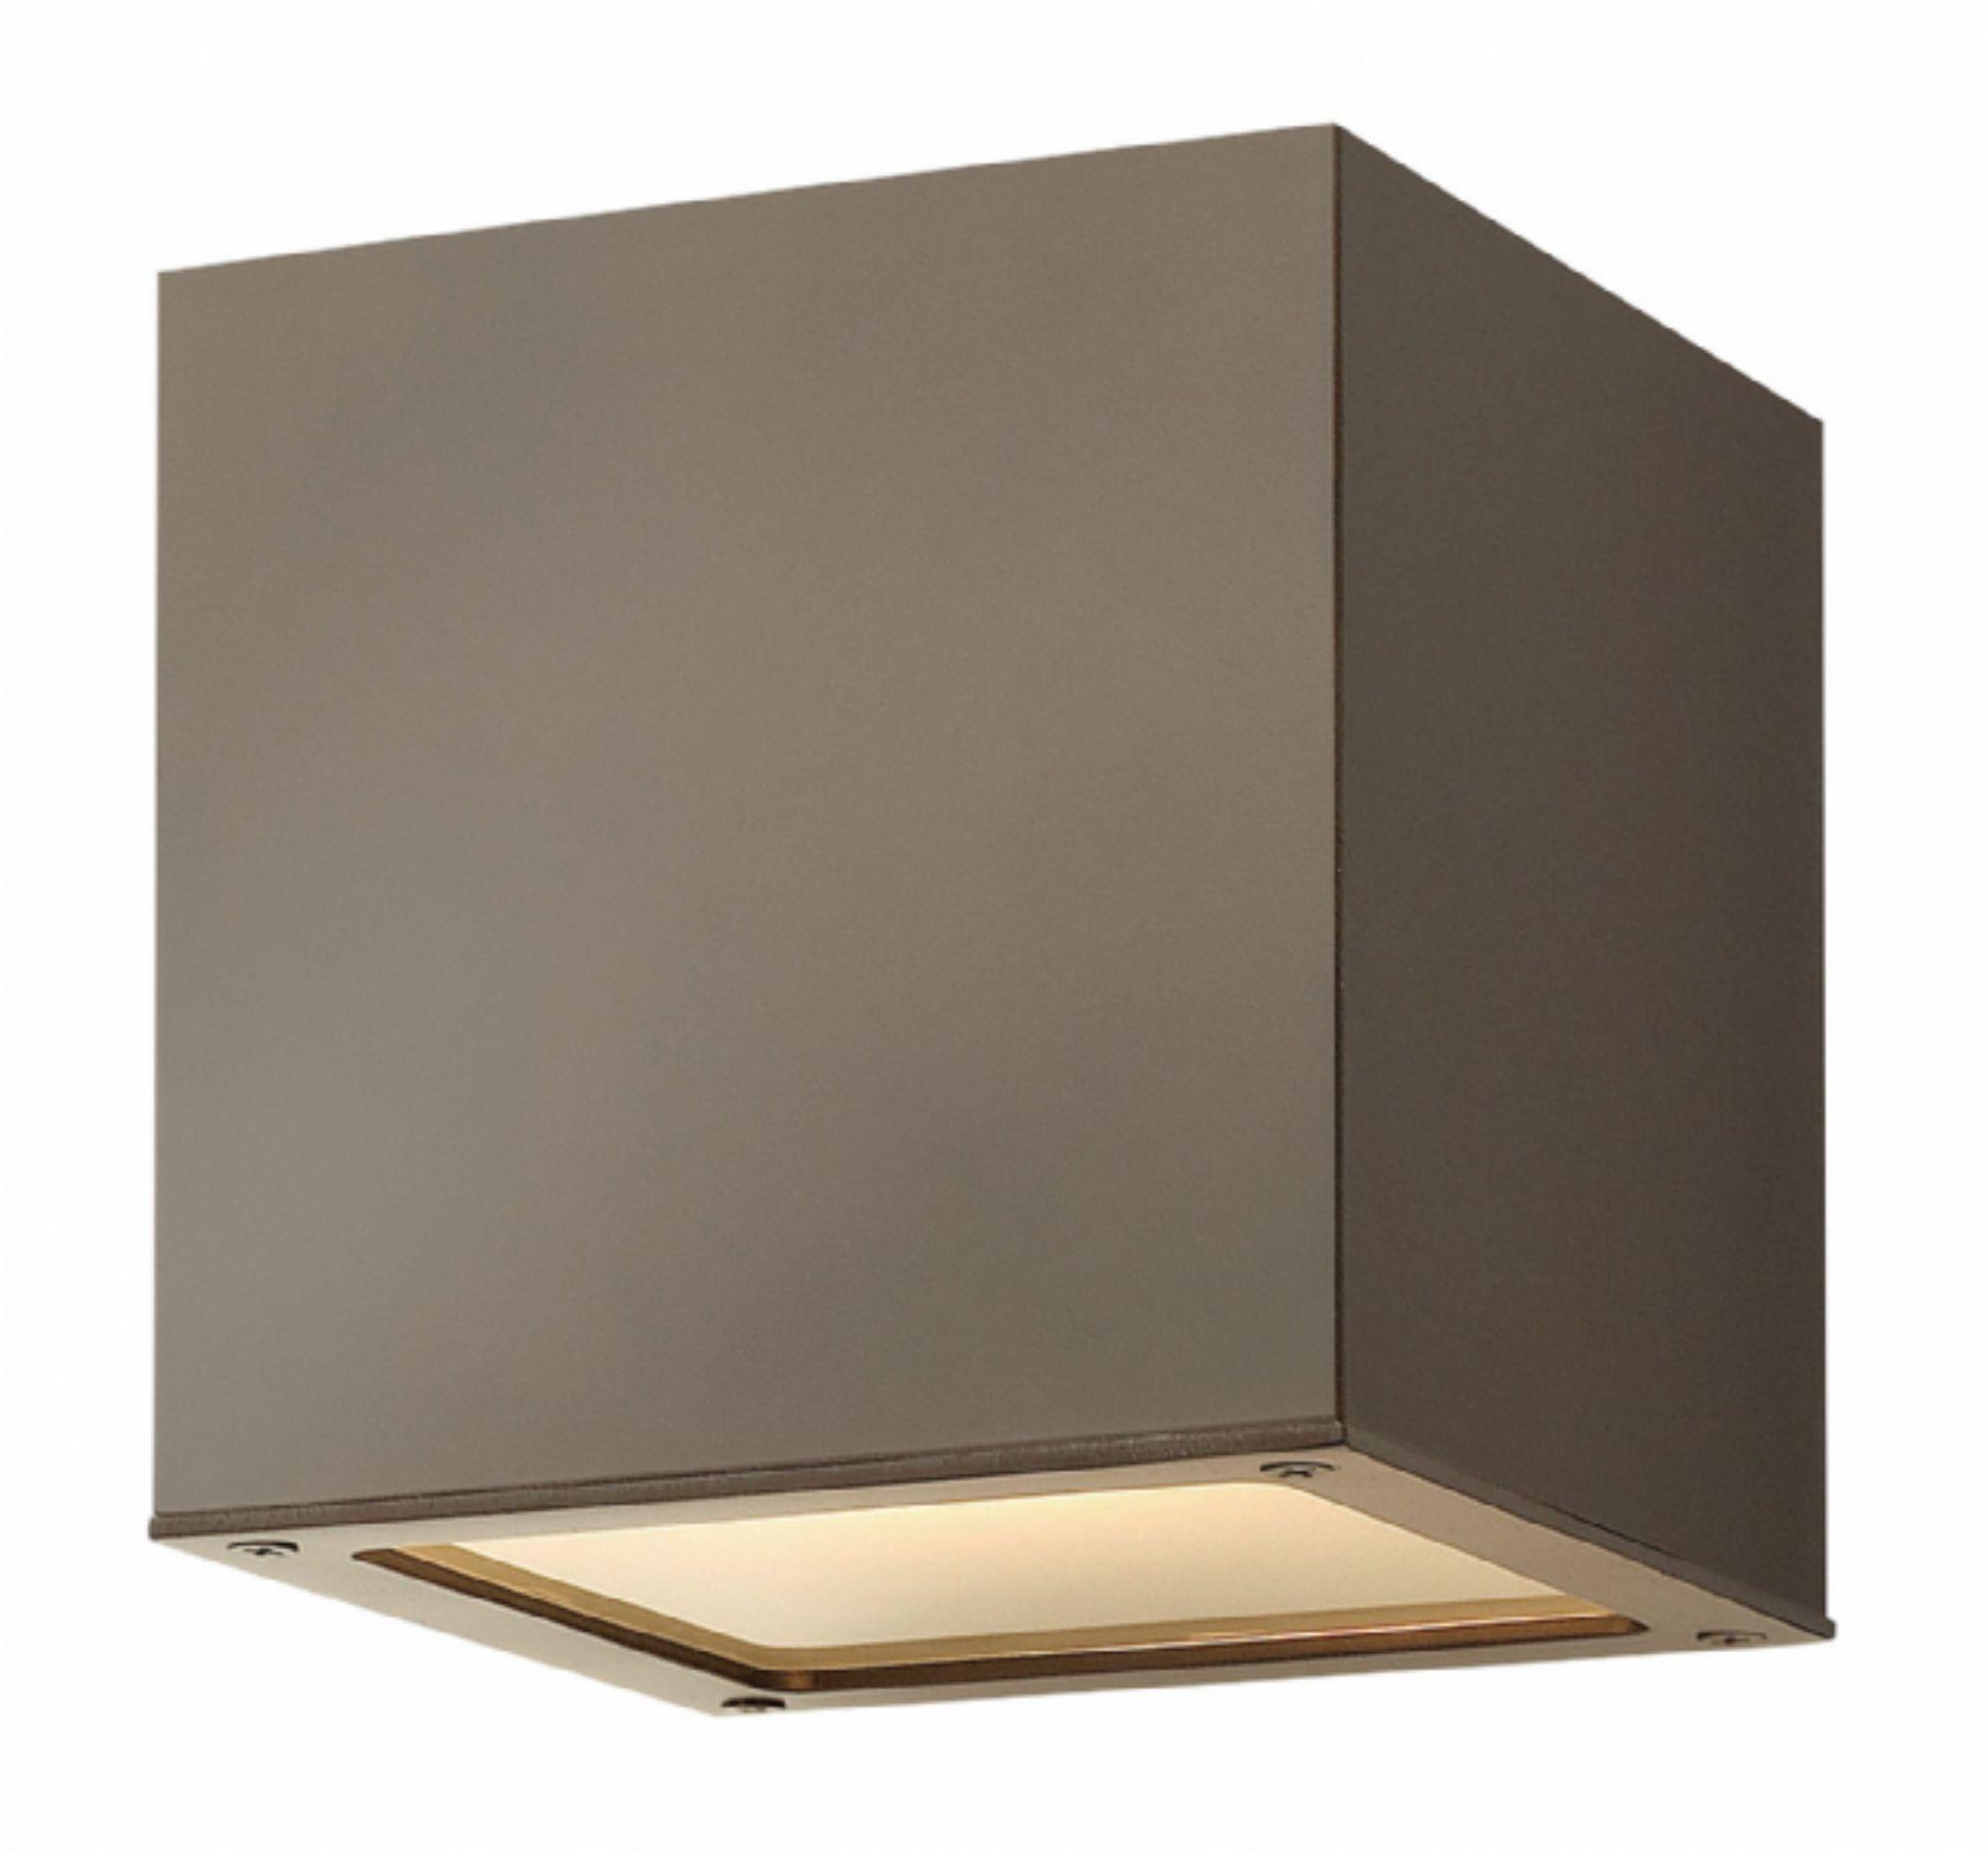 Bronze Kube > Exterior Wall Mount For Modern Outdoor Hinkley Lighting (#2 of 15)